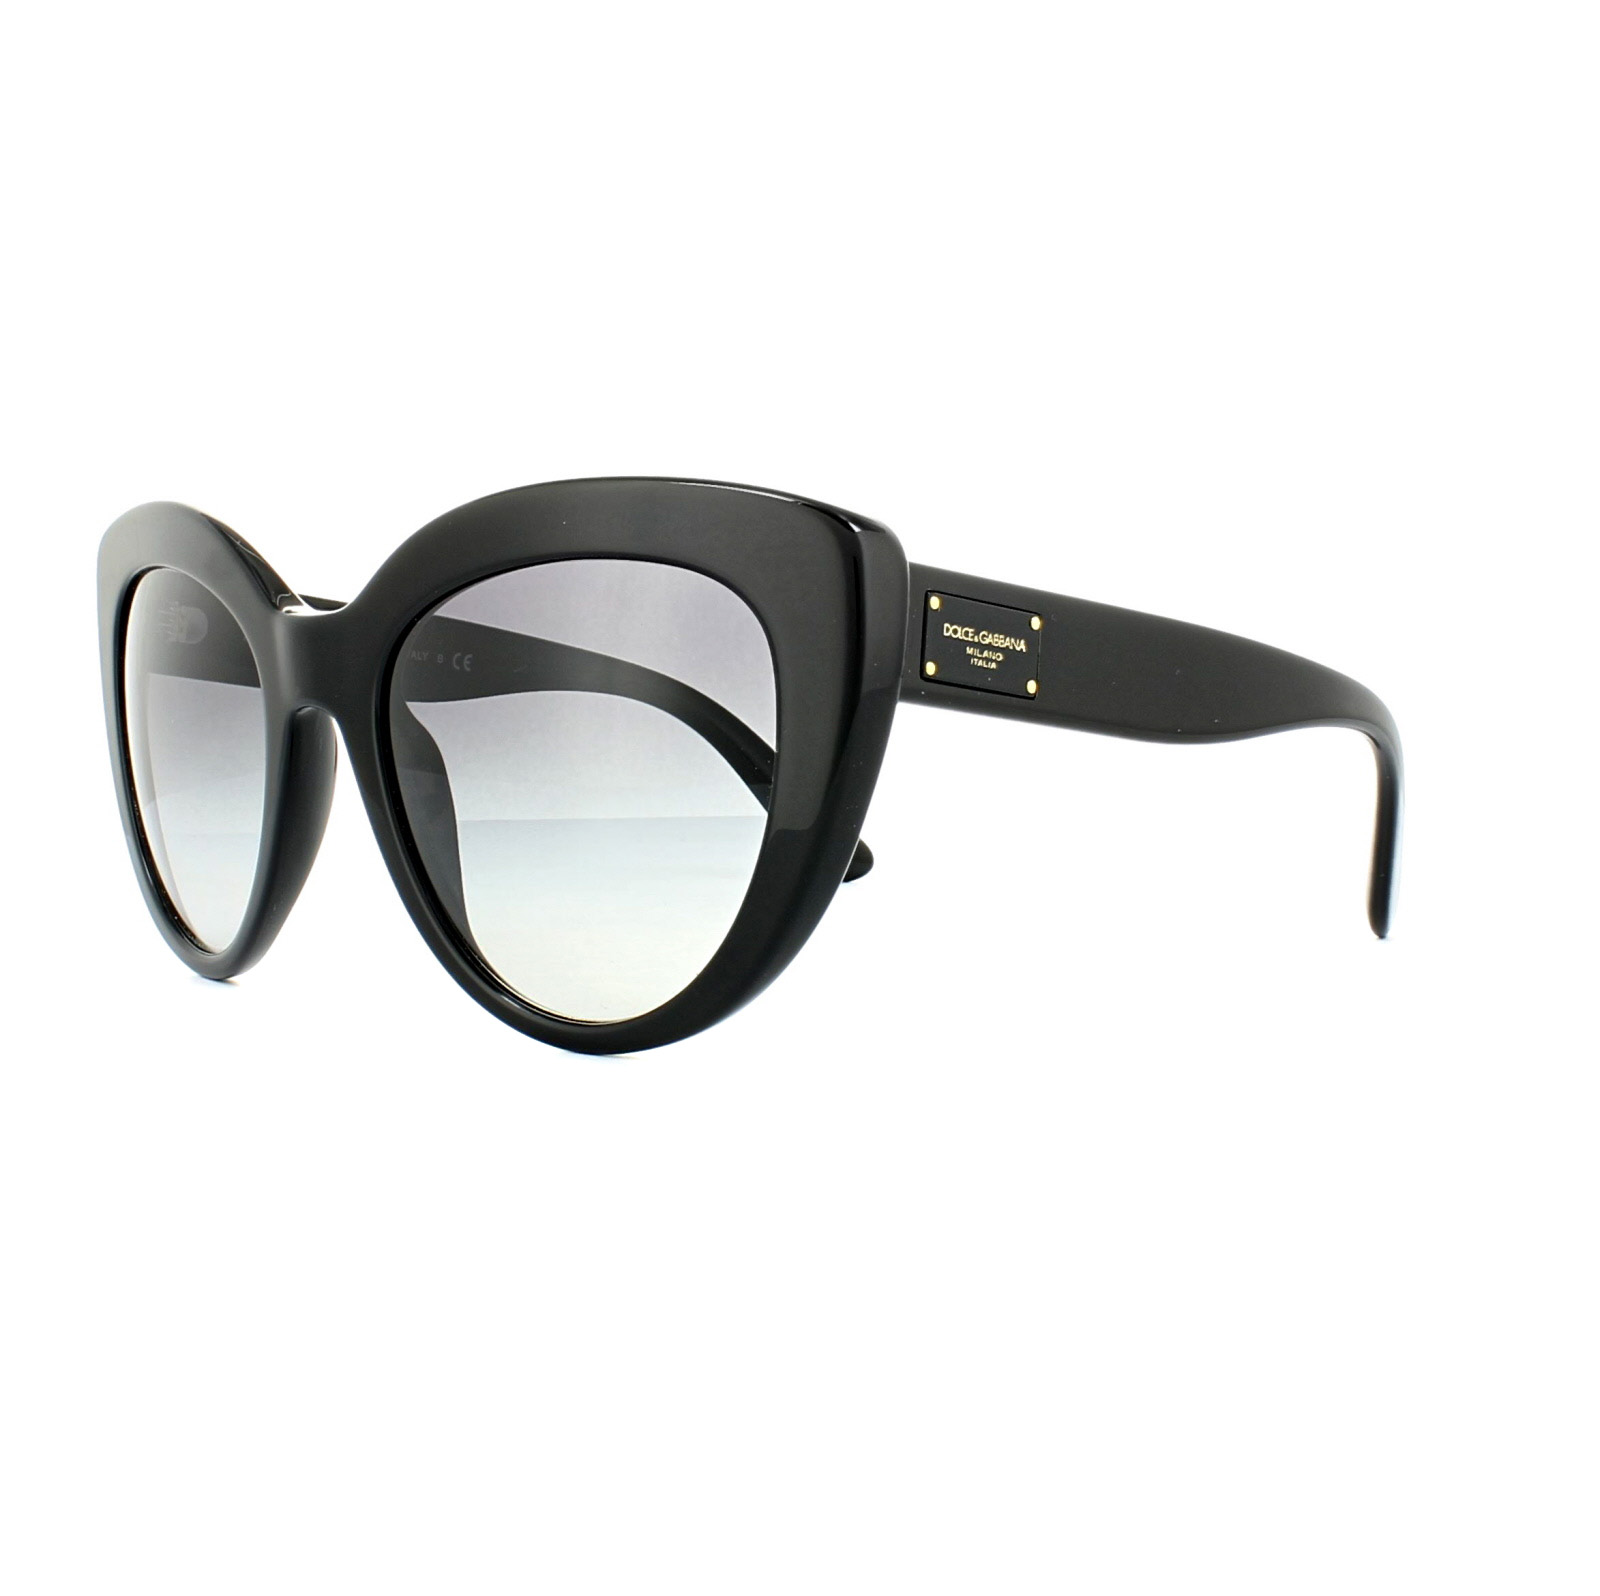 aea6fb4f637 Cheap Dolce   Gabbana 4287 Sunglasses - Discounted Sunglasses